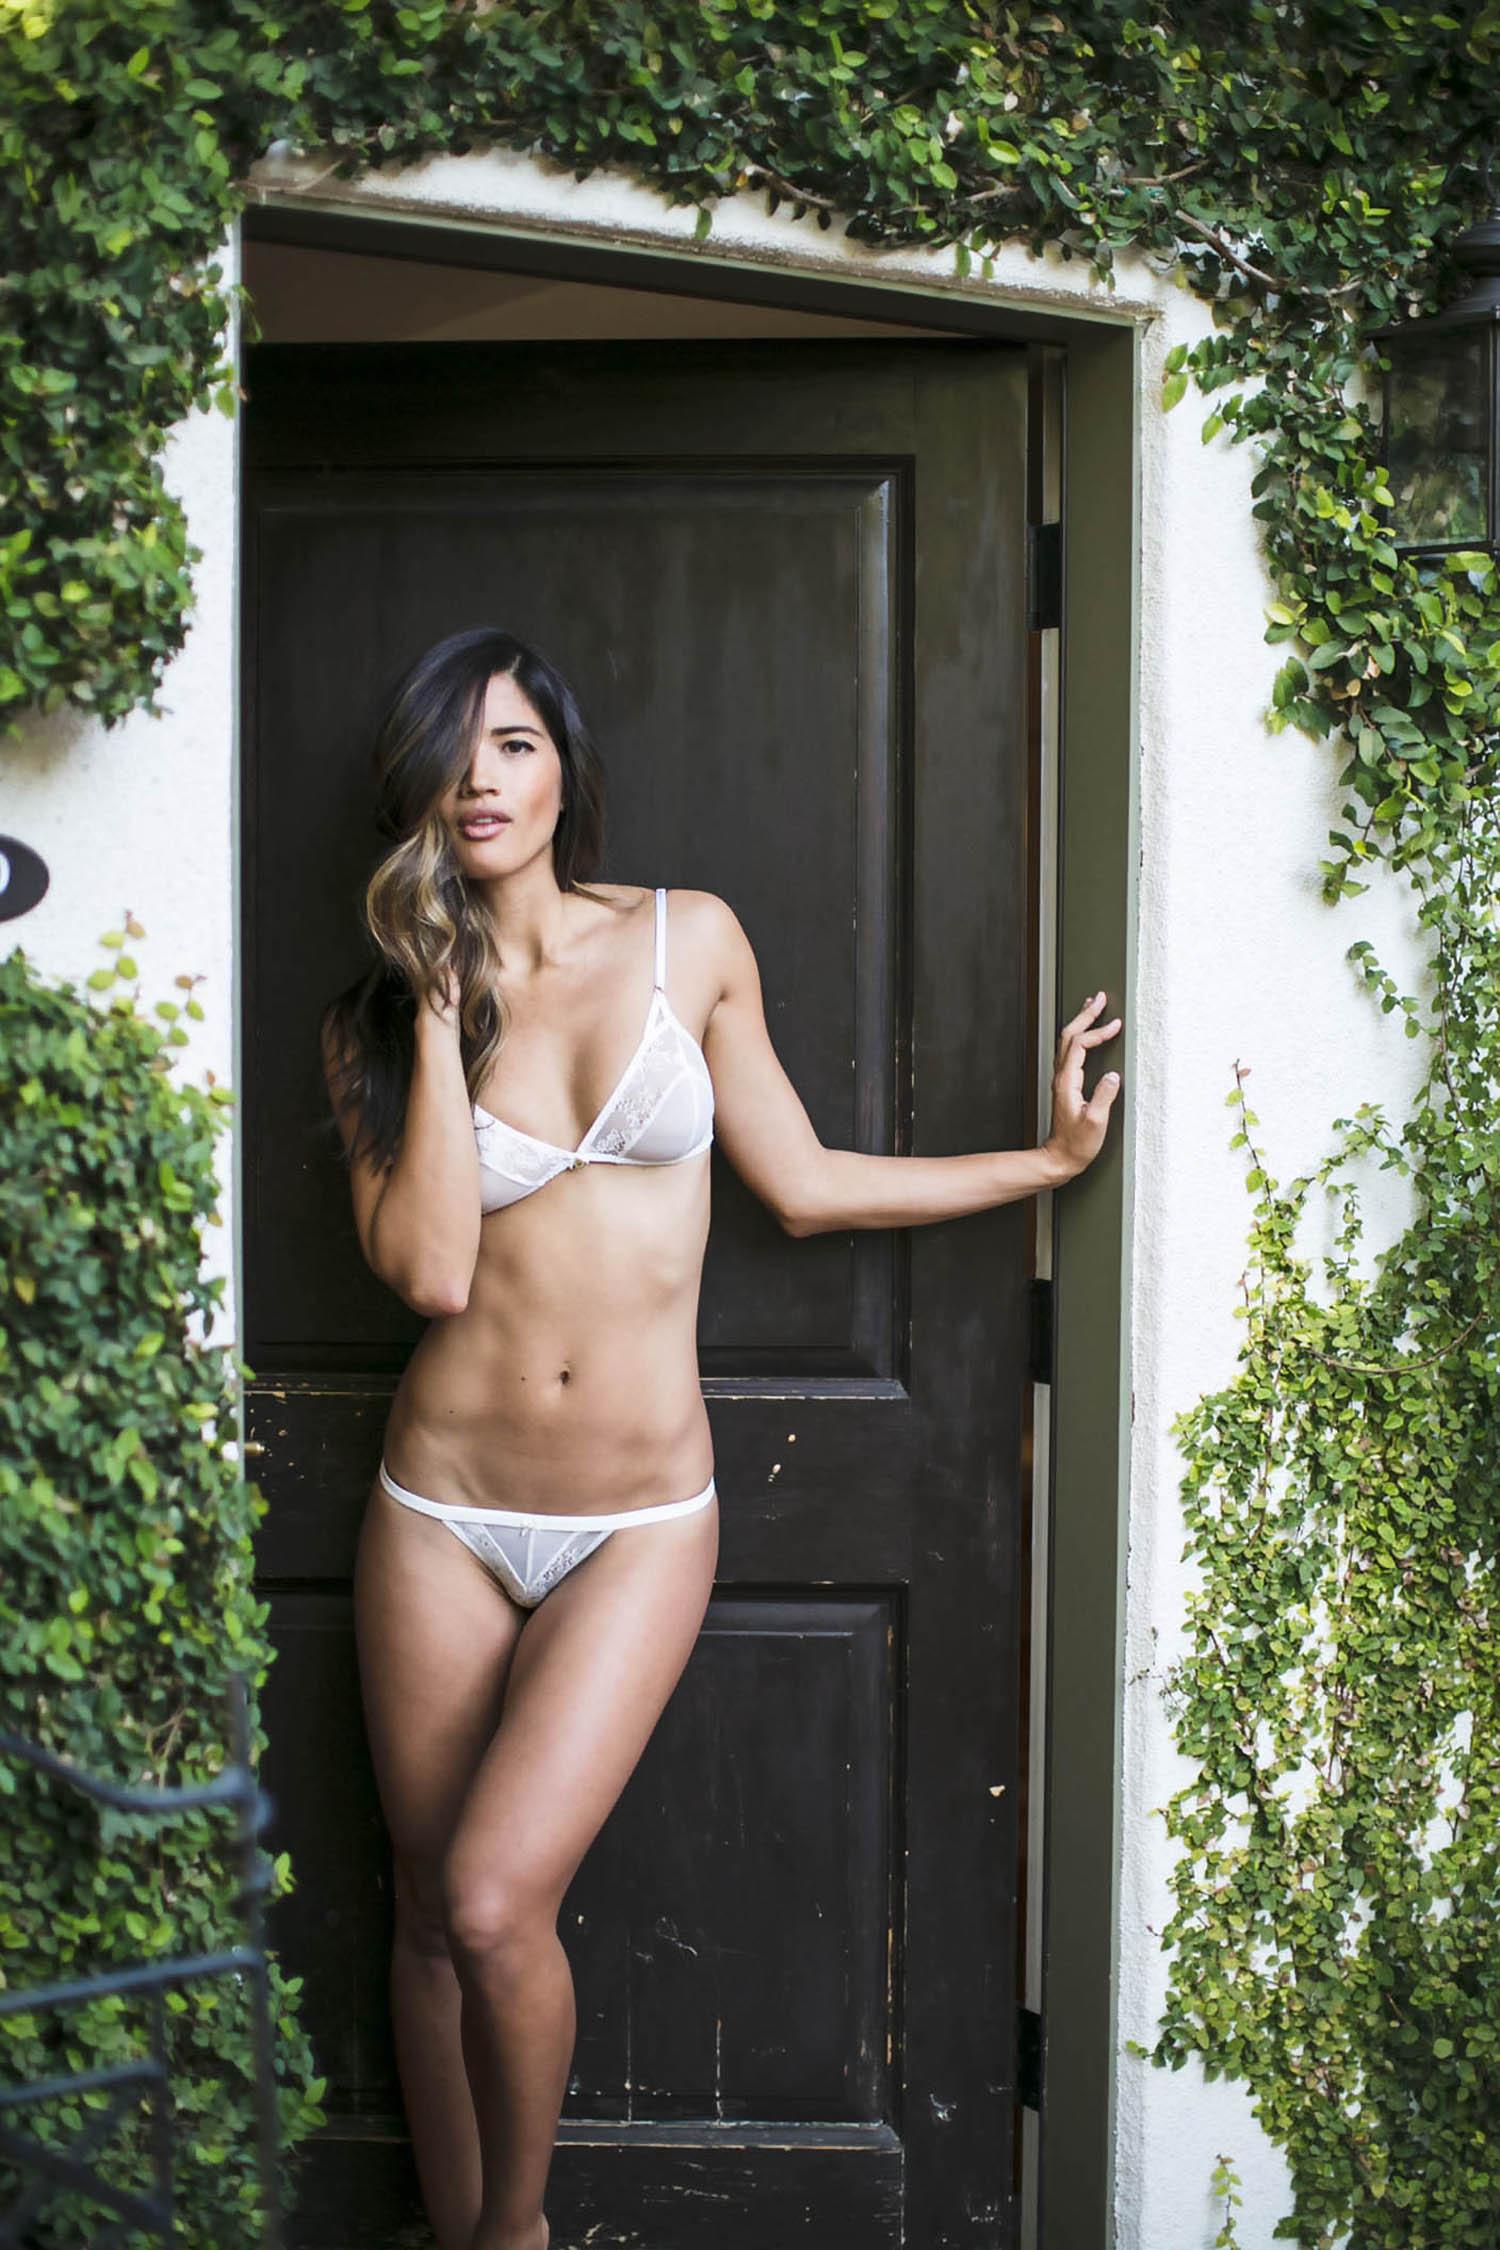 Laura Ponticorvo legs | Naked body parts of celebrities